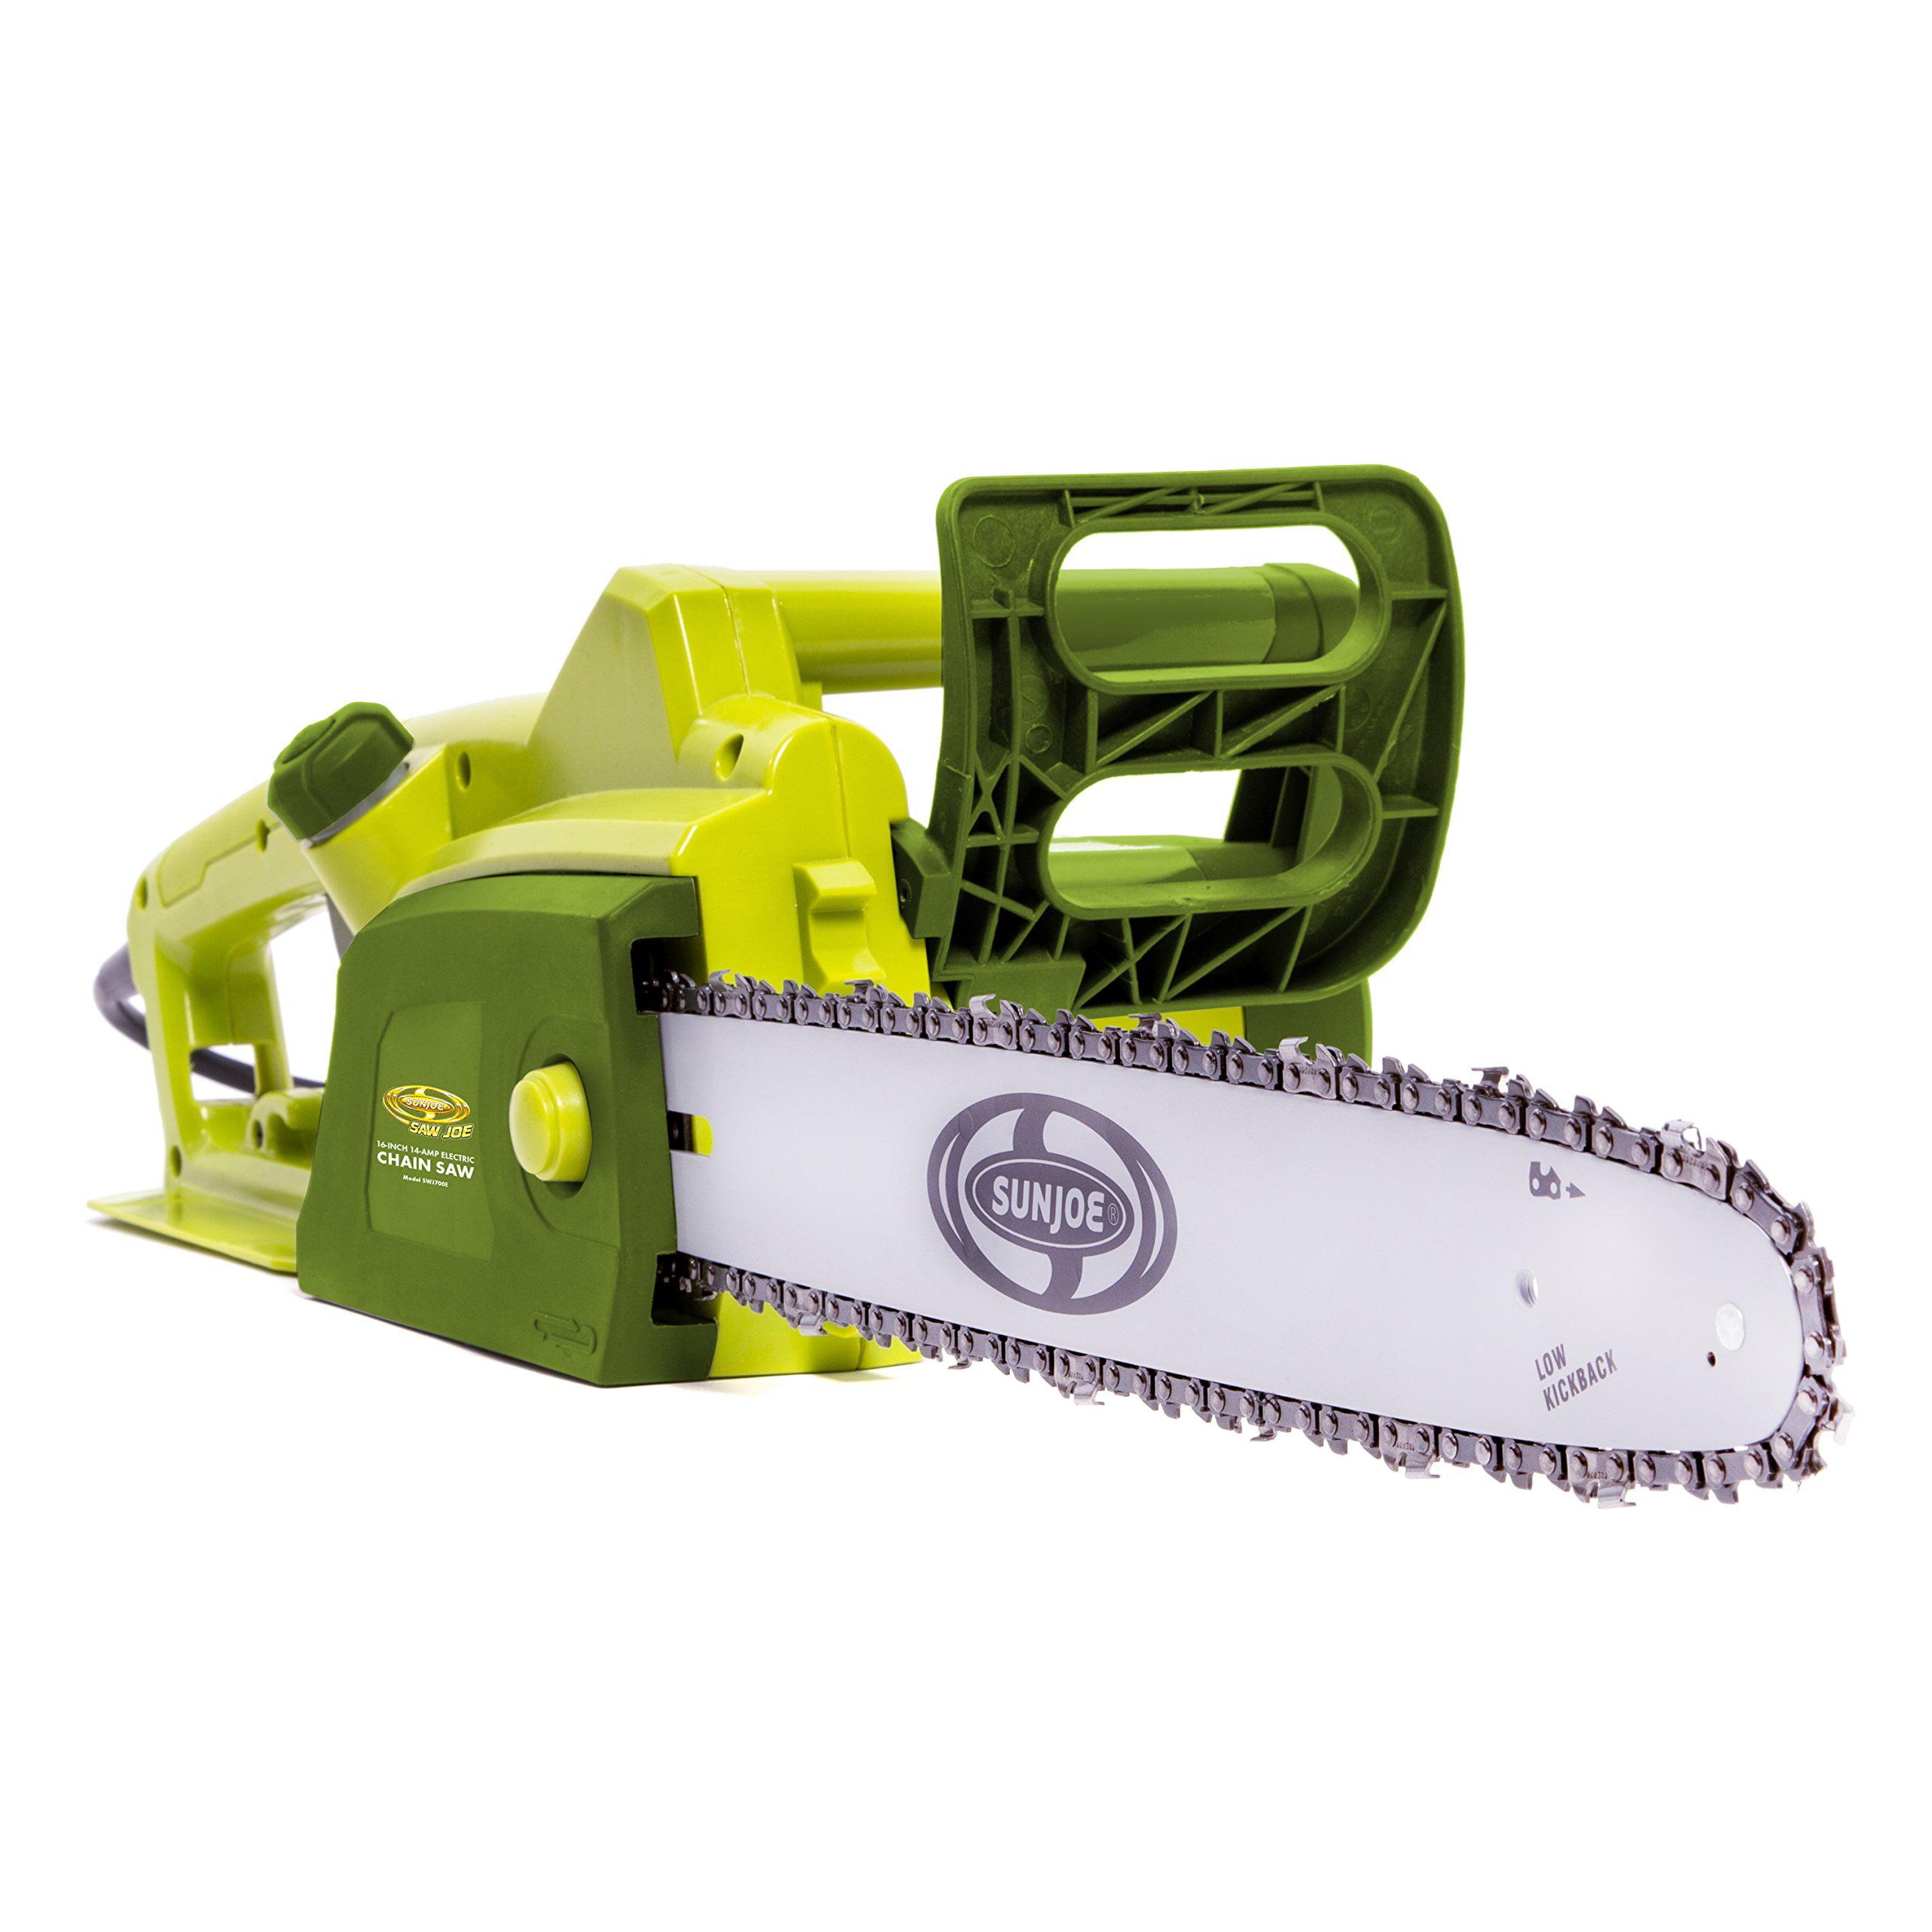 Sun Joe 6-inch 14-amp Electric Chain Saw Swj700e - 8000 Rpm - Variable Speed - 14 A (swj700e)